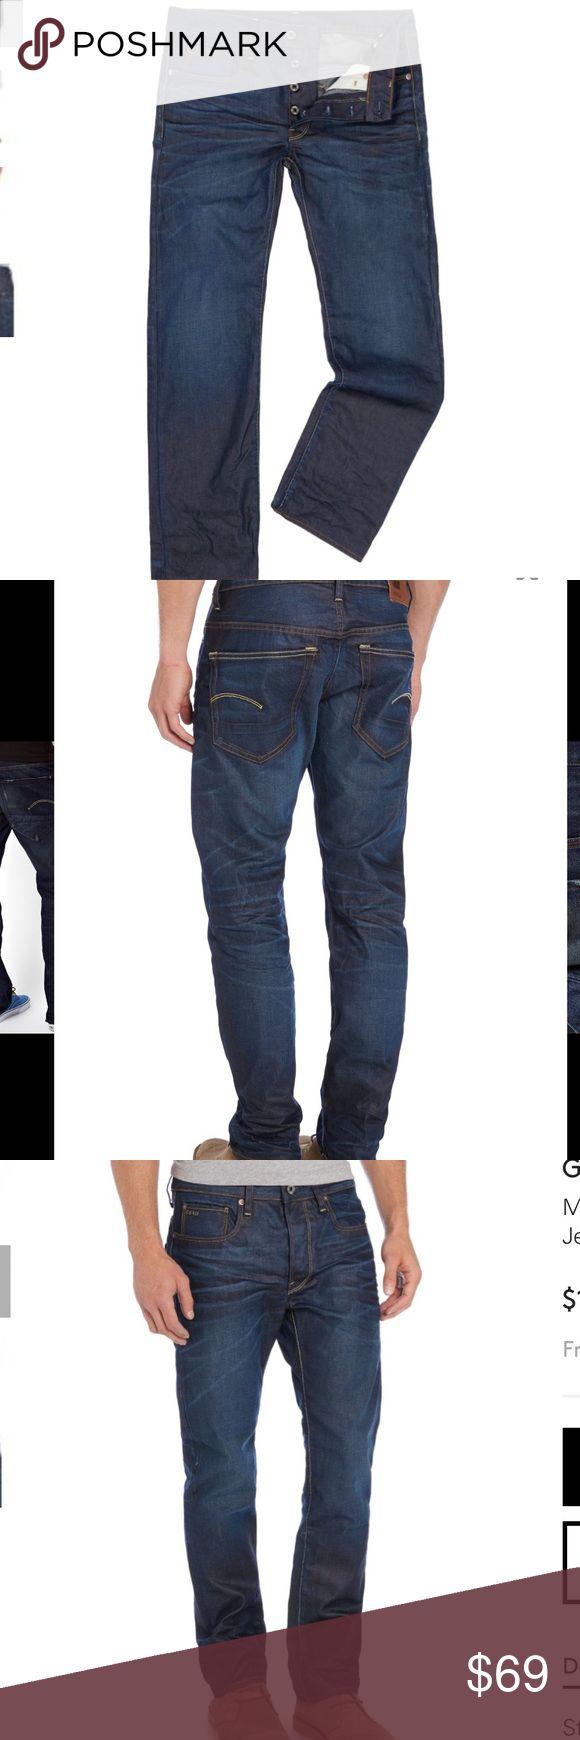 G-Star Raw jeans straight leg Sz 32 blue Men's dark wash straight leg jeans Sz 32 reg G-Star Jeans Straight